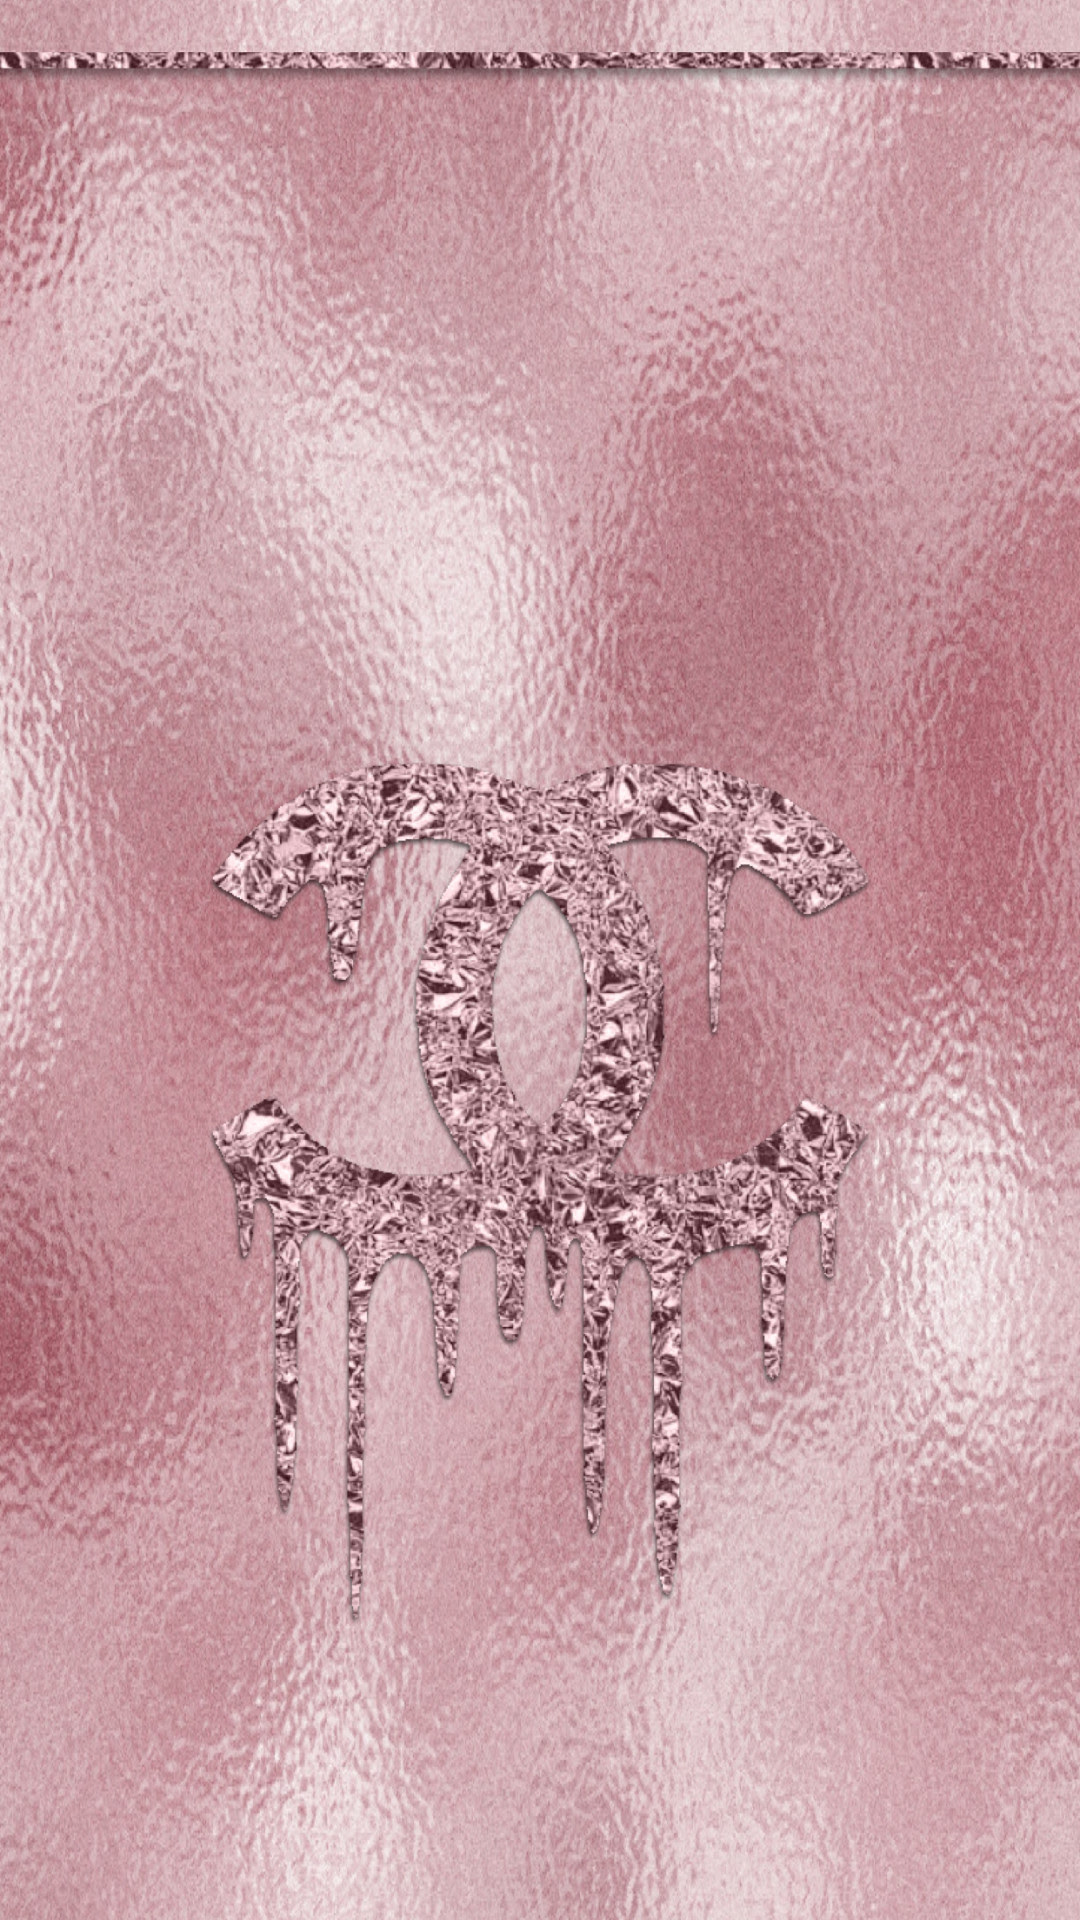 Rose Gold Supreme Wallpaper Nosirix